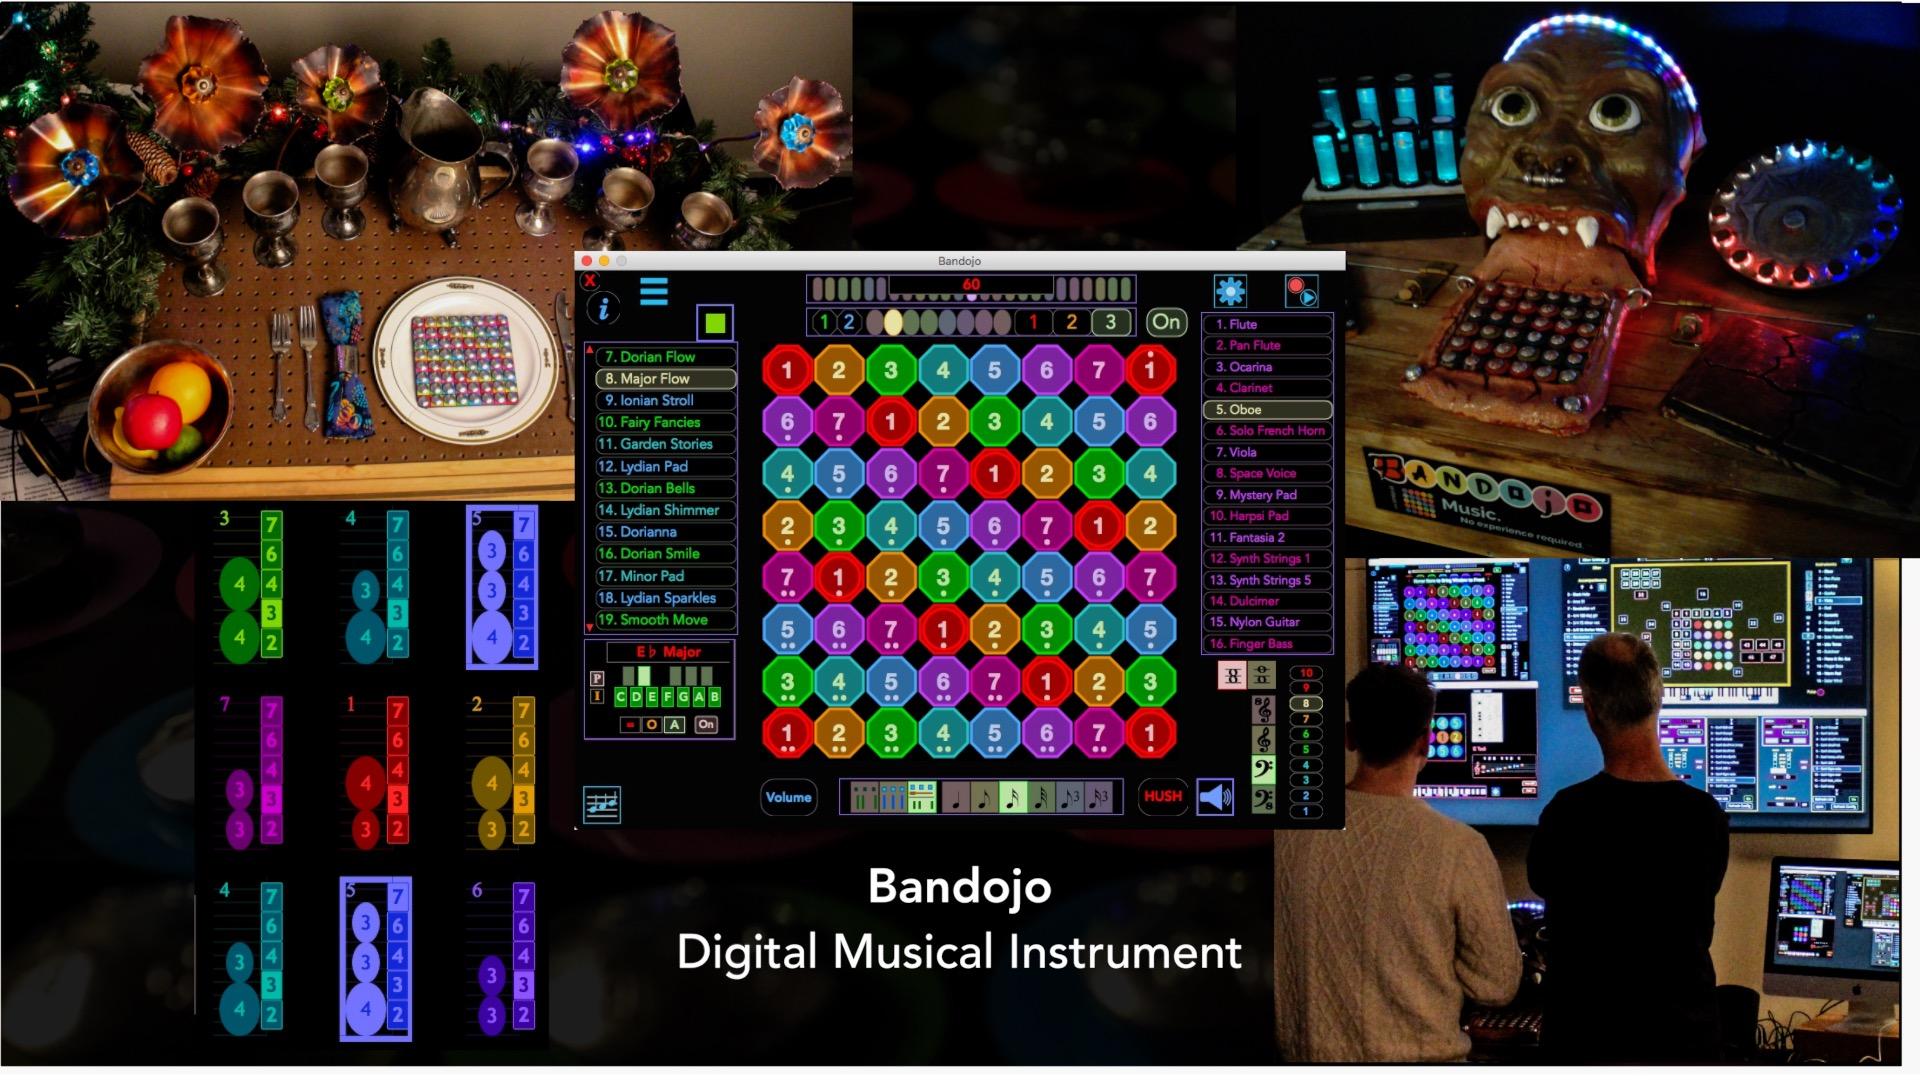 Bandojo DMI Overview